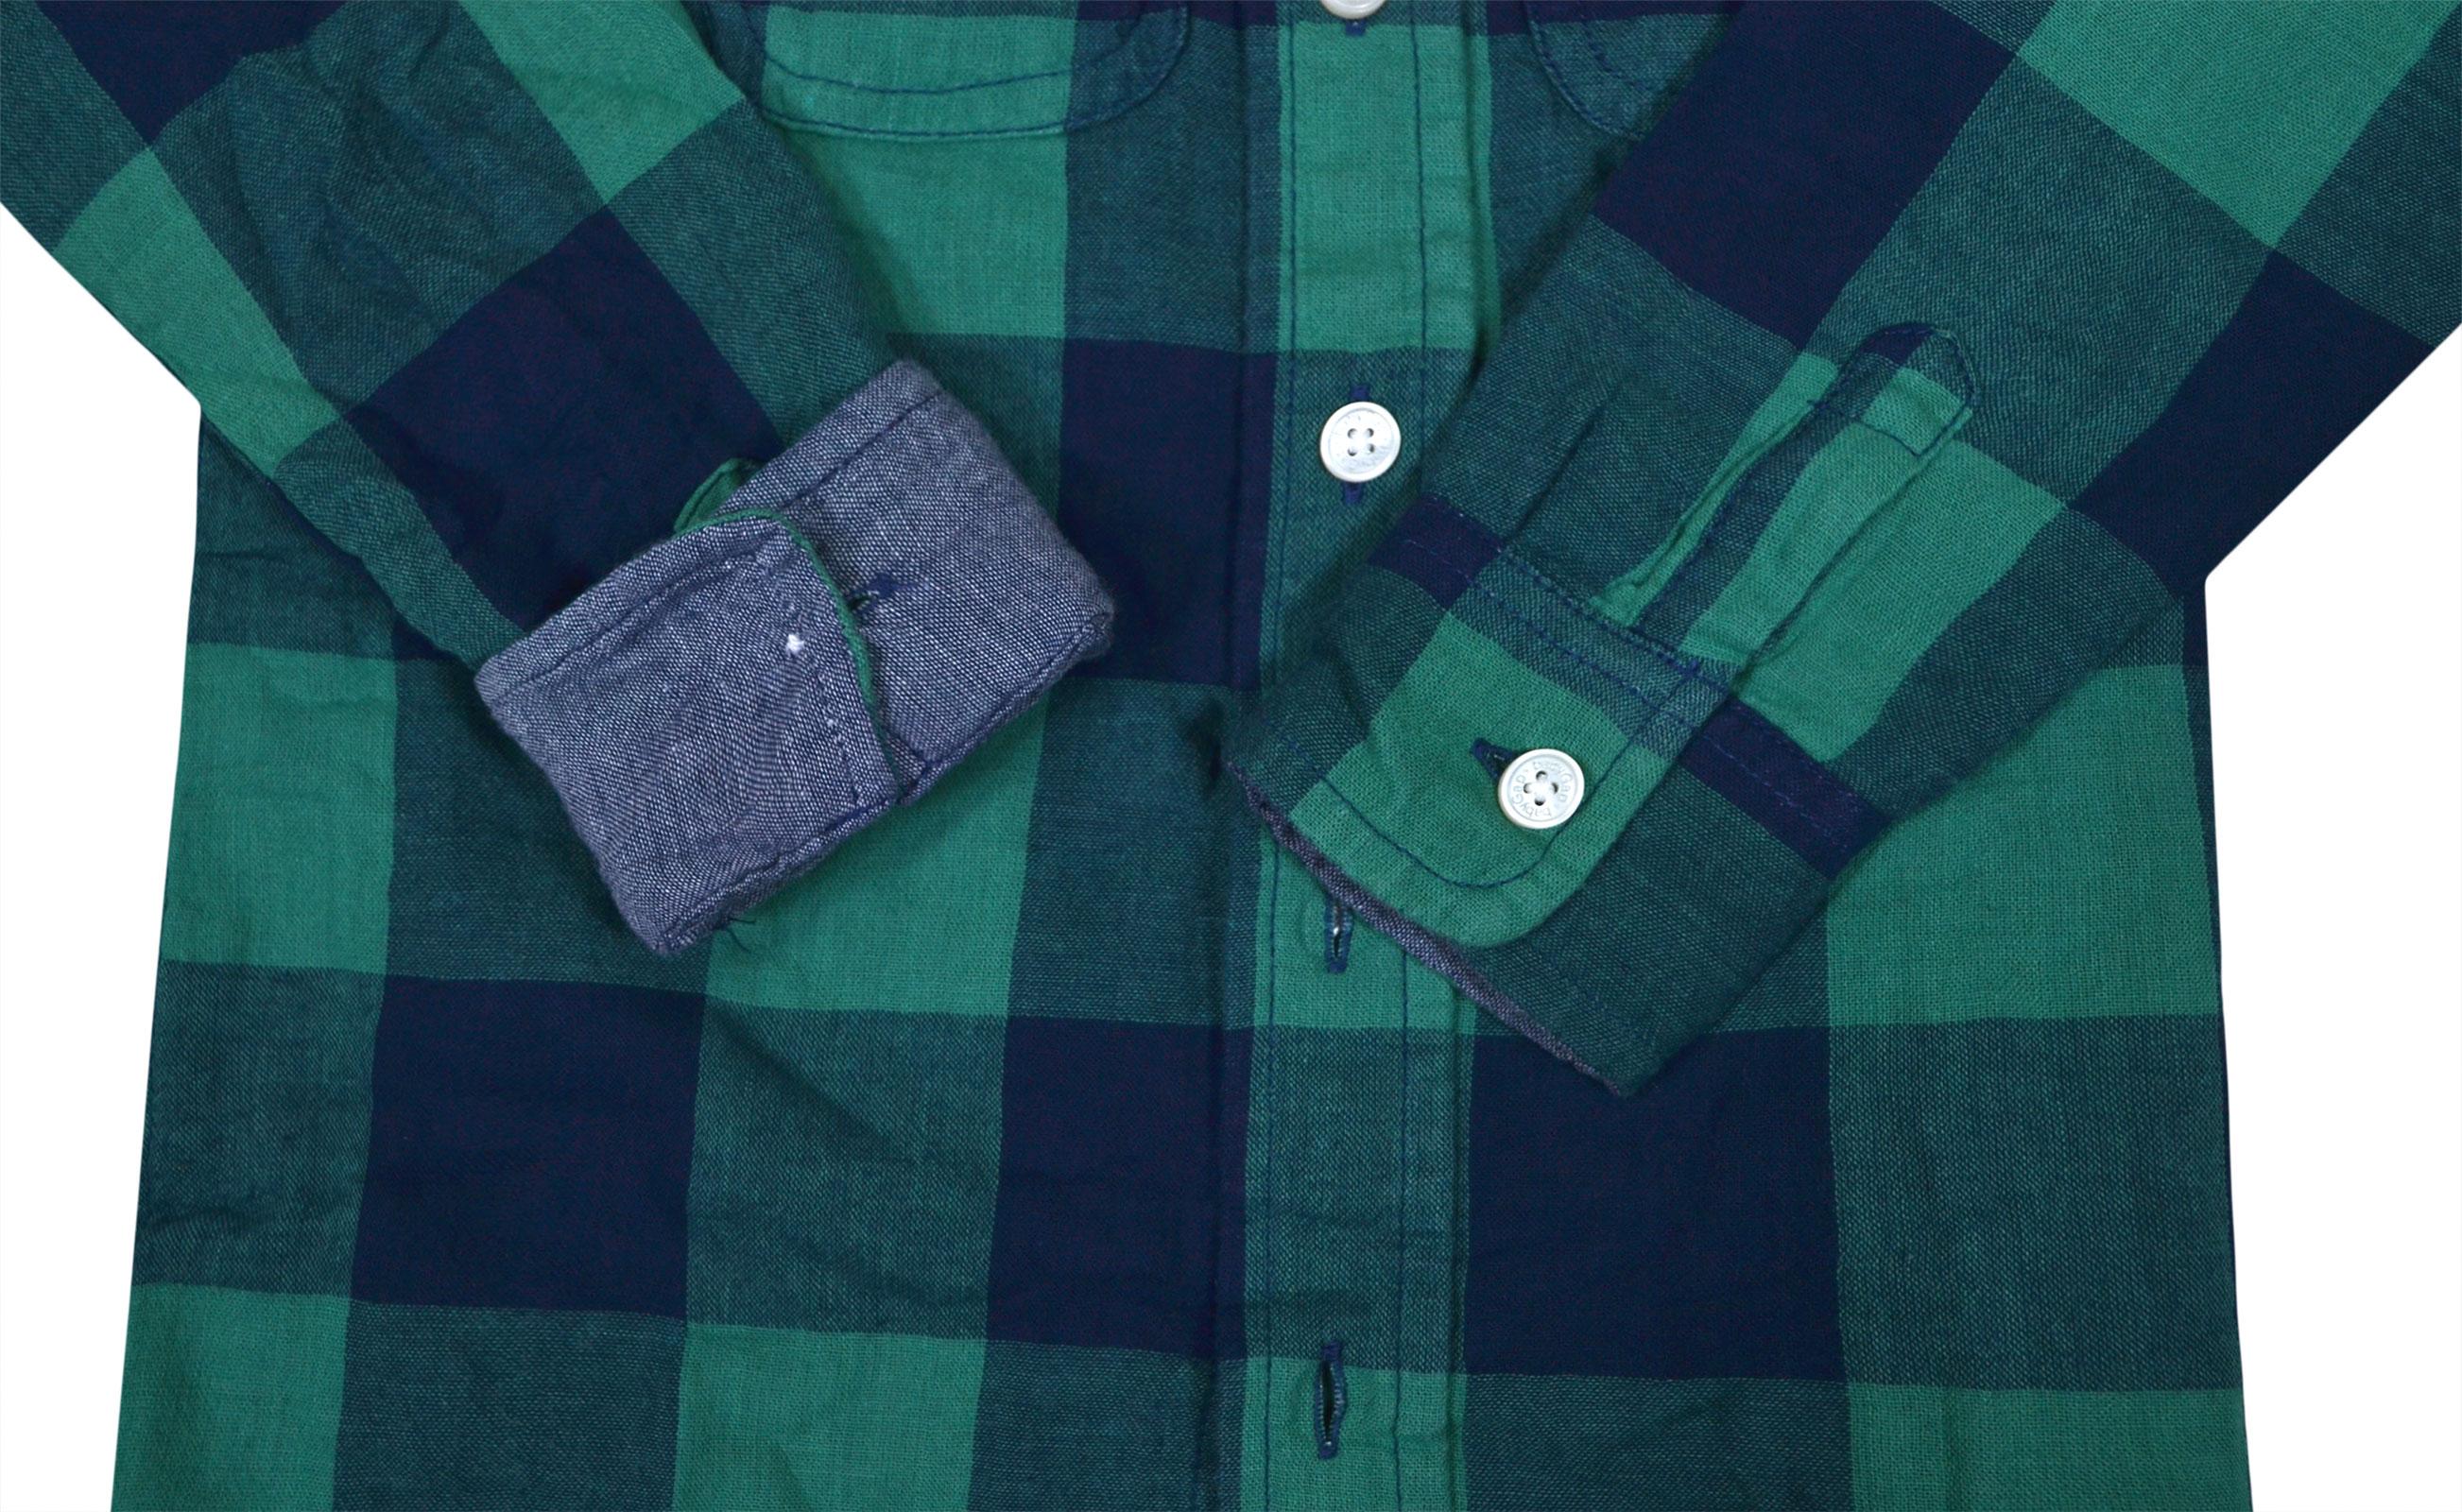 Boys-Ex-GAP-Shirt-Boy-Long-Sleeve-Cotton-Top-Green-Check-Ages-2-3-4-5-6-Years miniatura 5